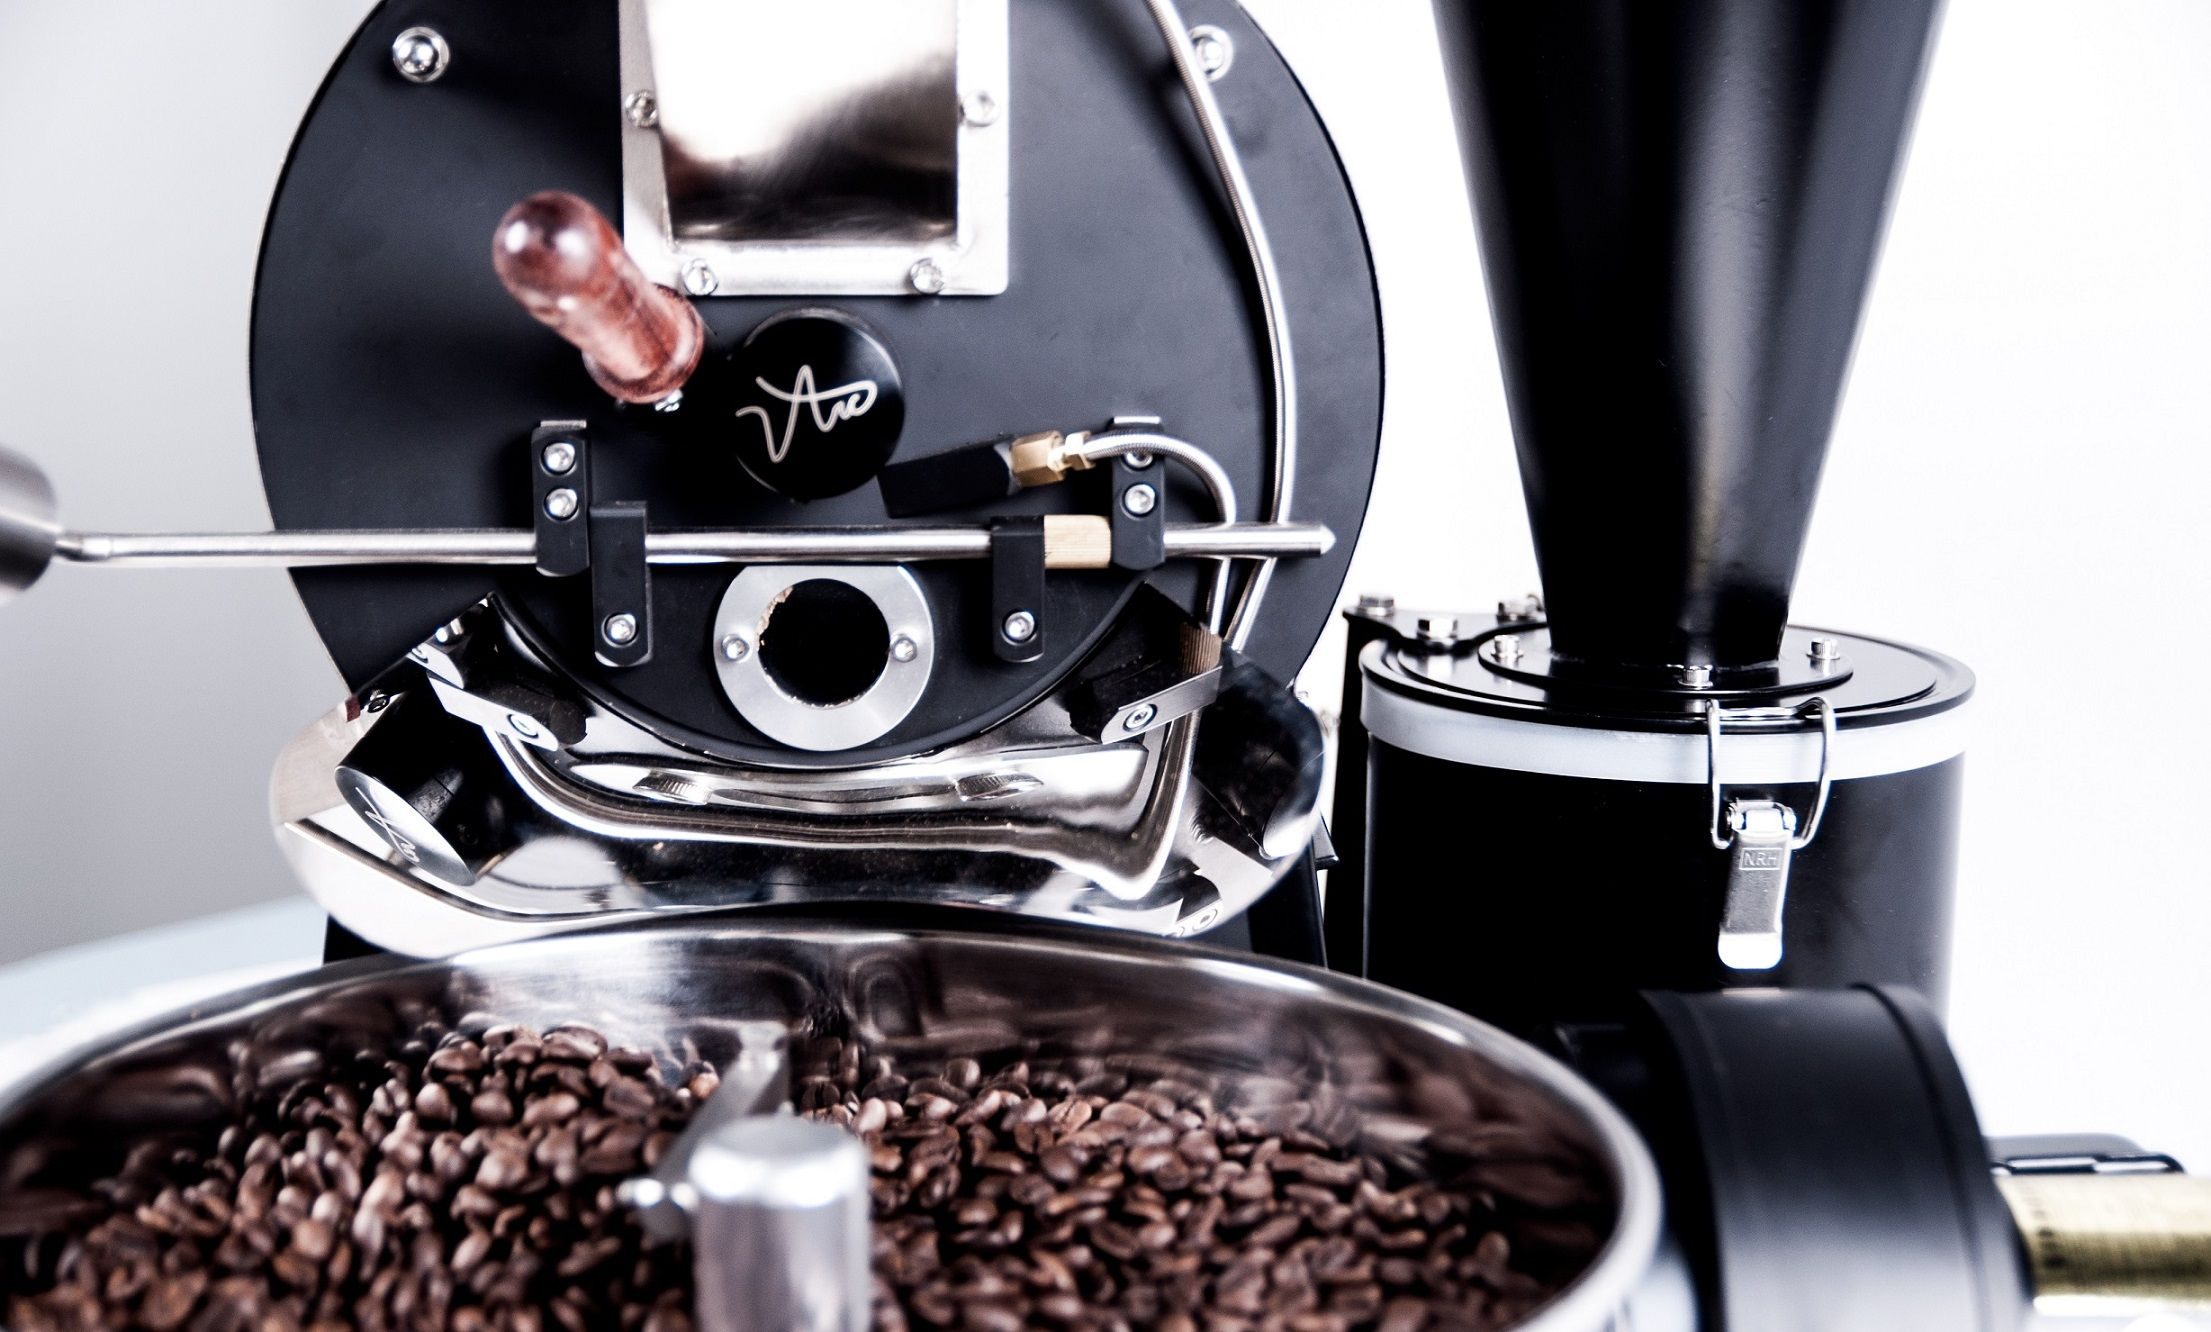 Arc Roaster 700g Professional Coffee Roaster Coffee